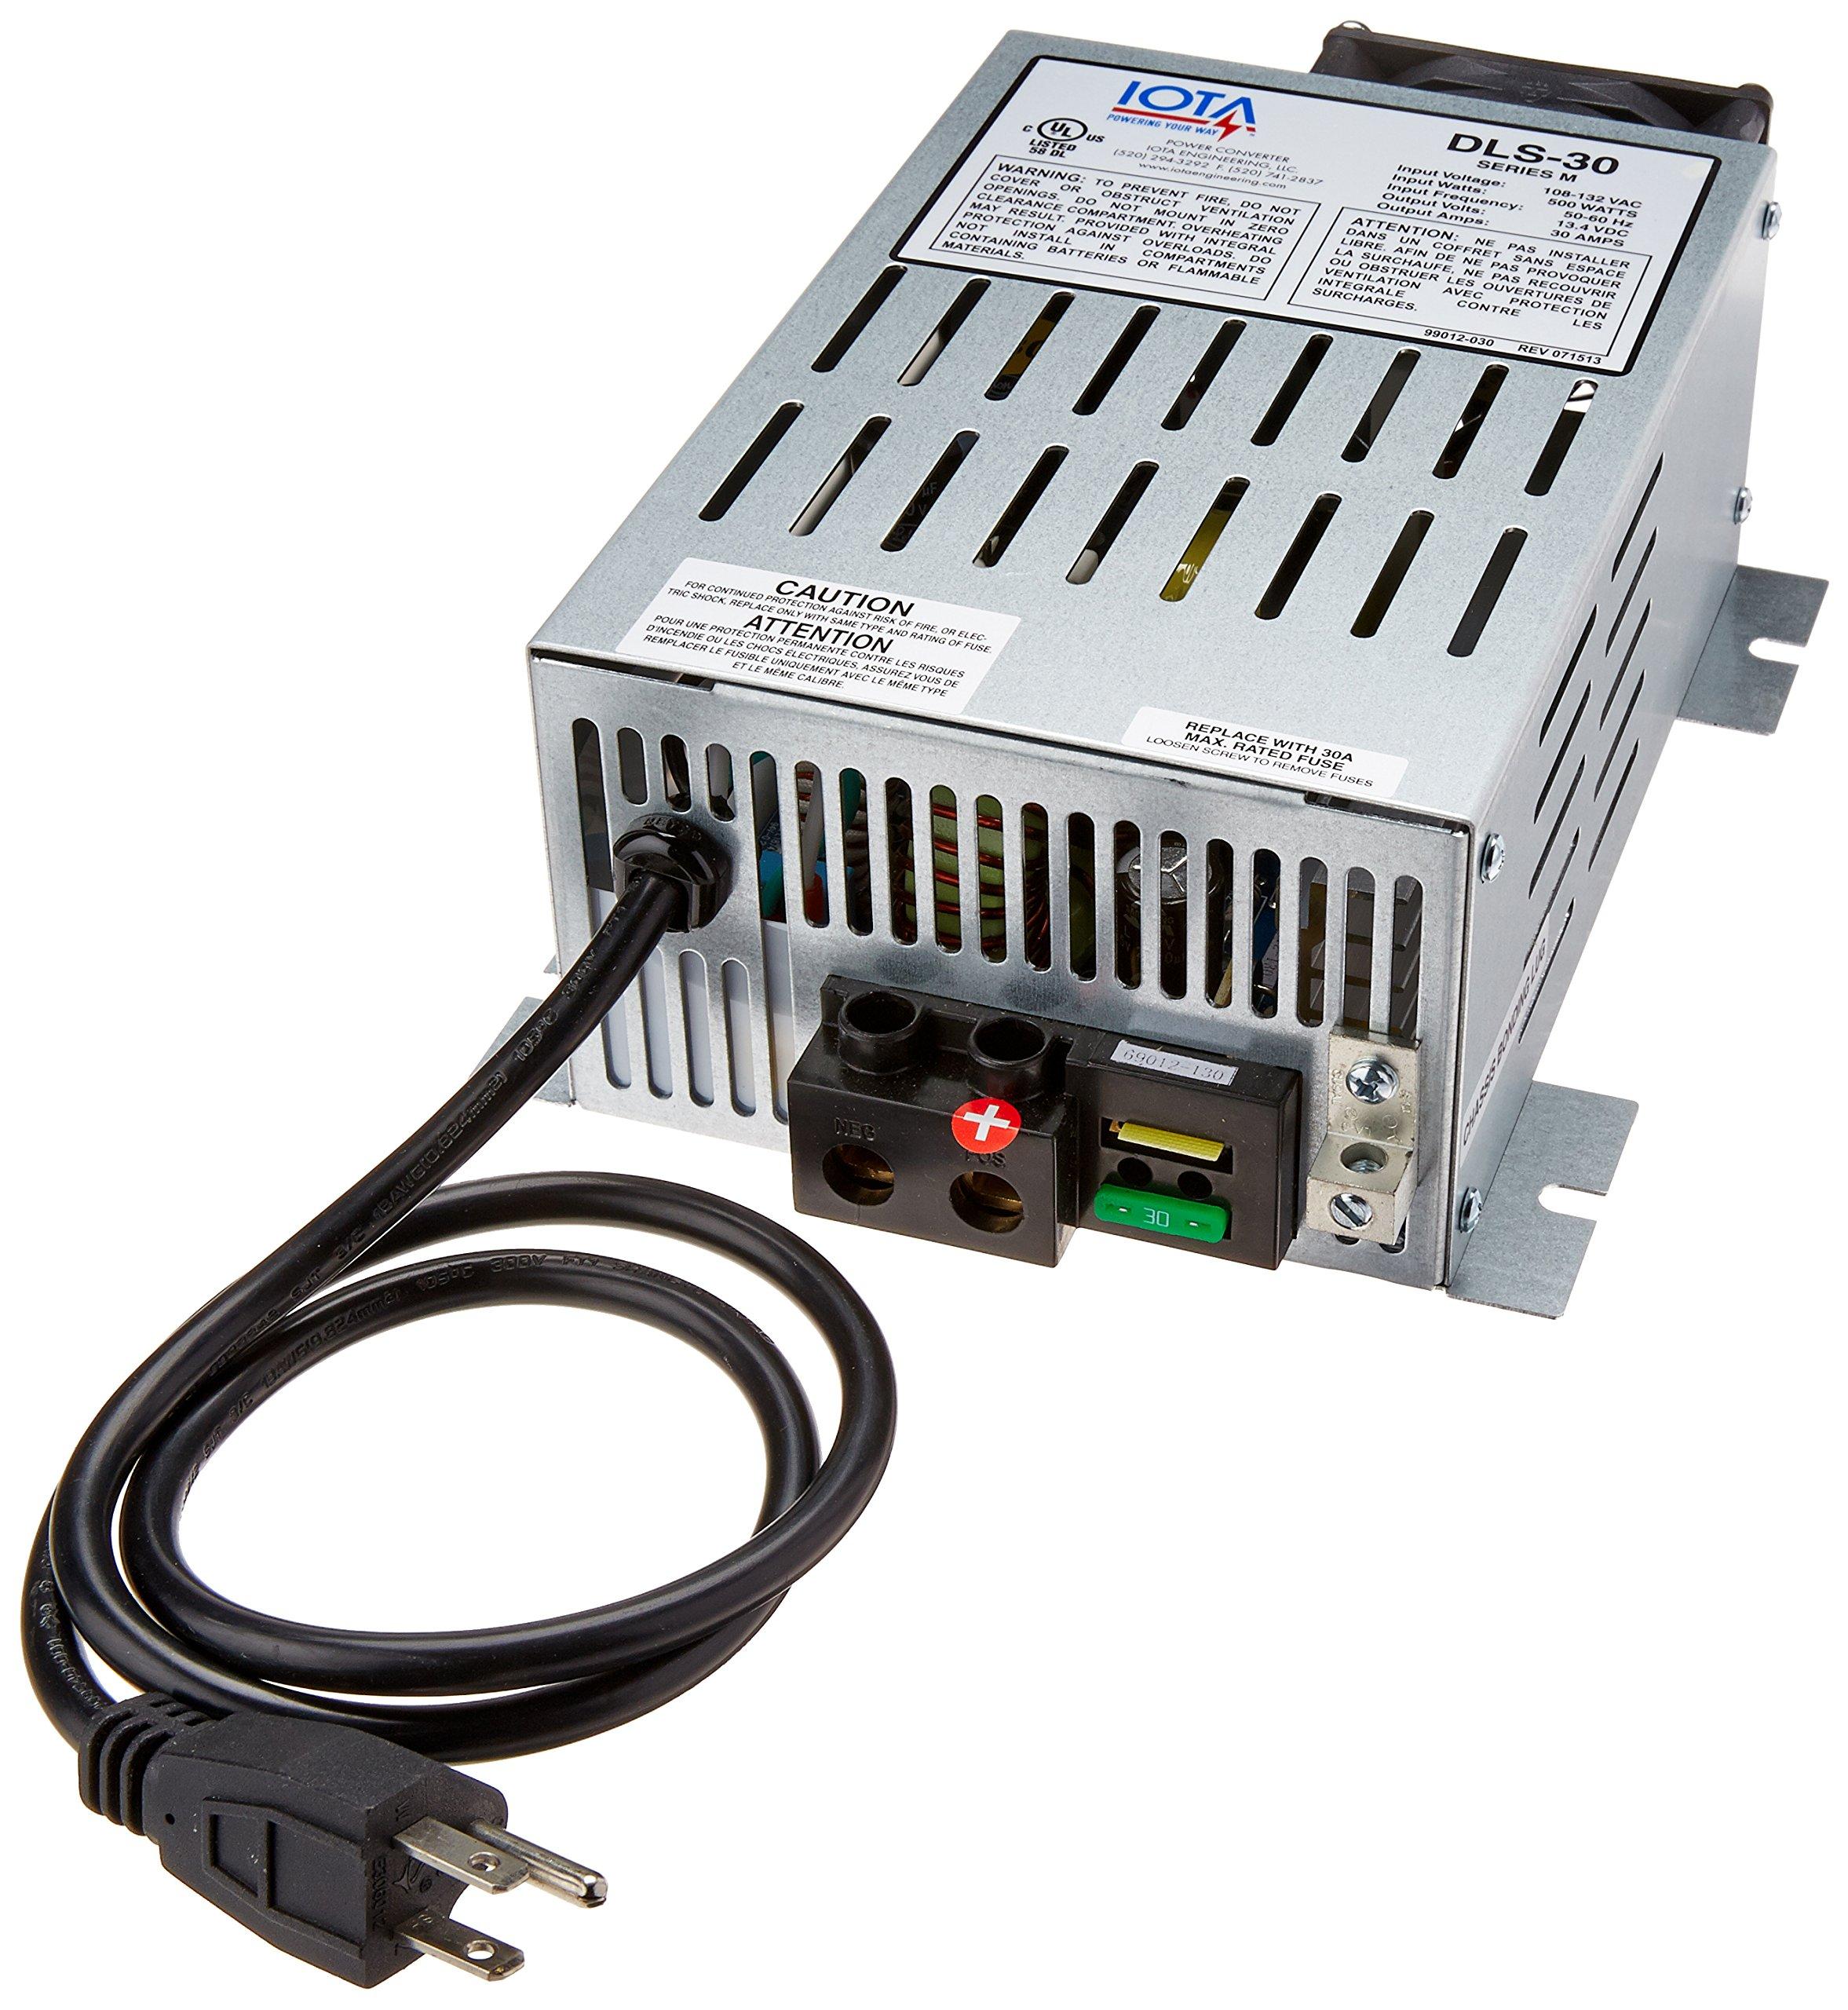 IOTA Engineering (DLS30 30 Amp Power Converter/Battery Charger by IOTA Engineering